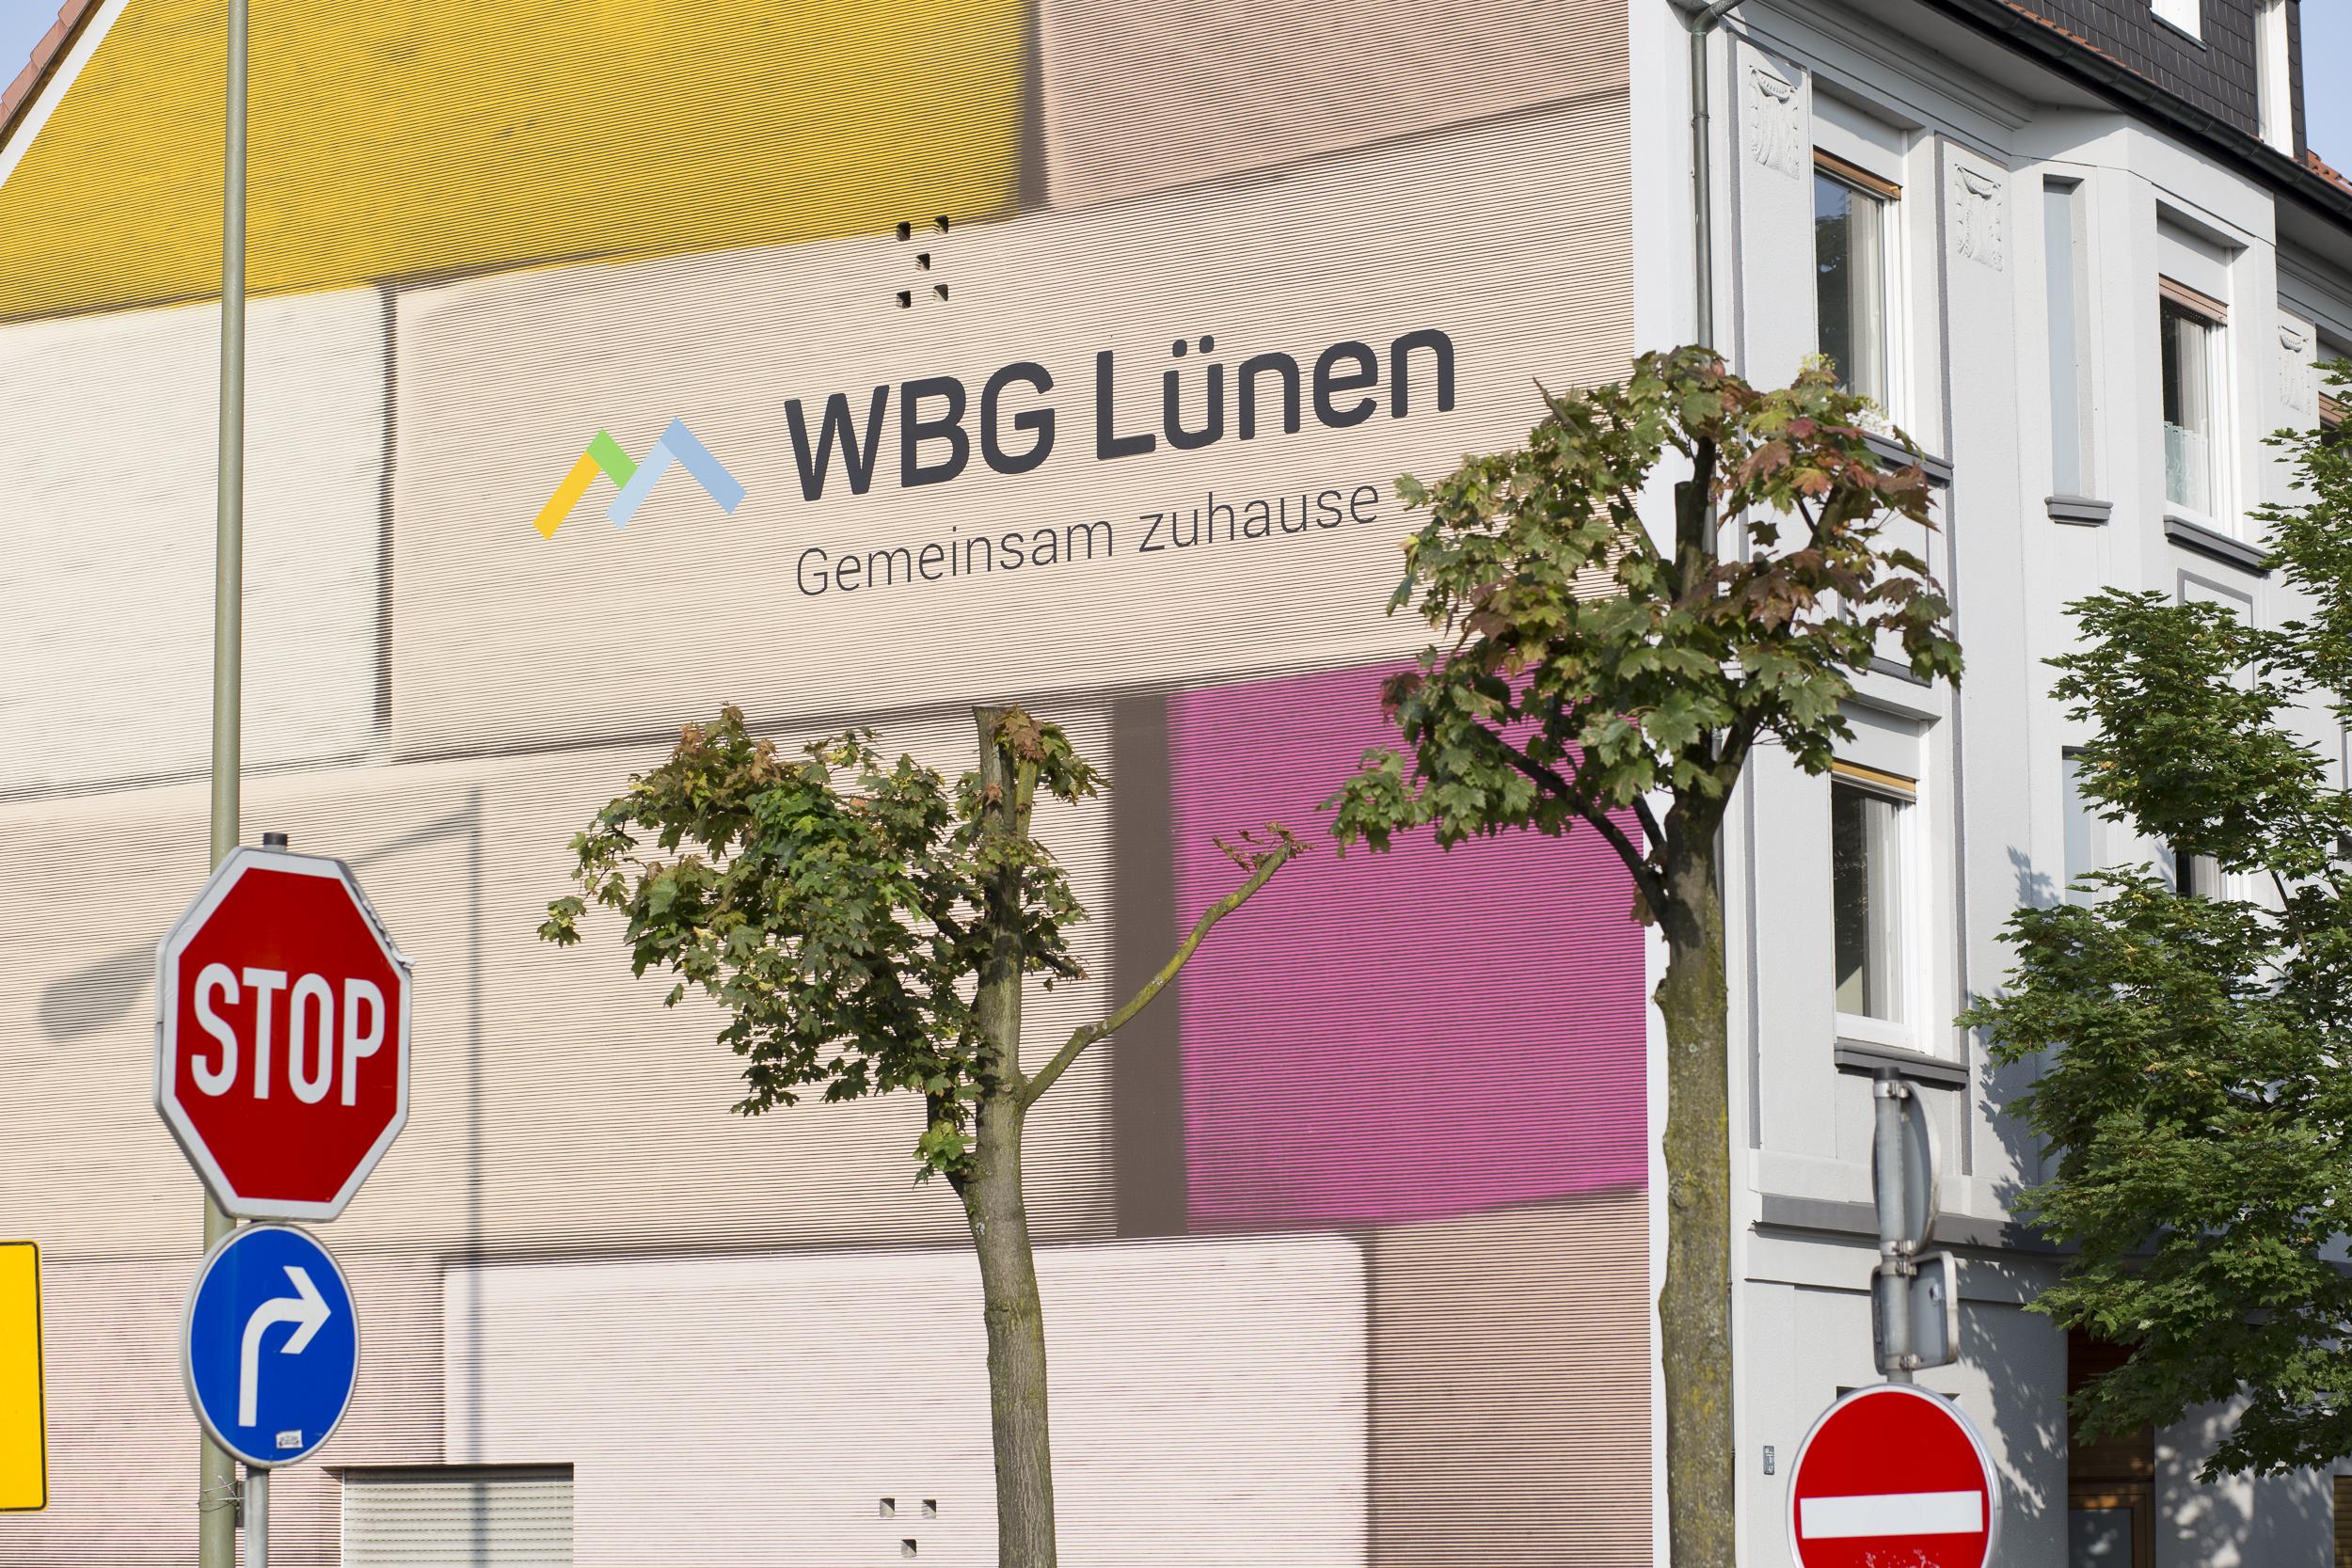 Wandmalerei-Luenen-Giebel-Wohnhaus-Putz-Bild.jpg